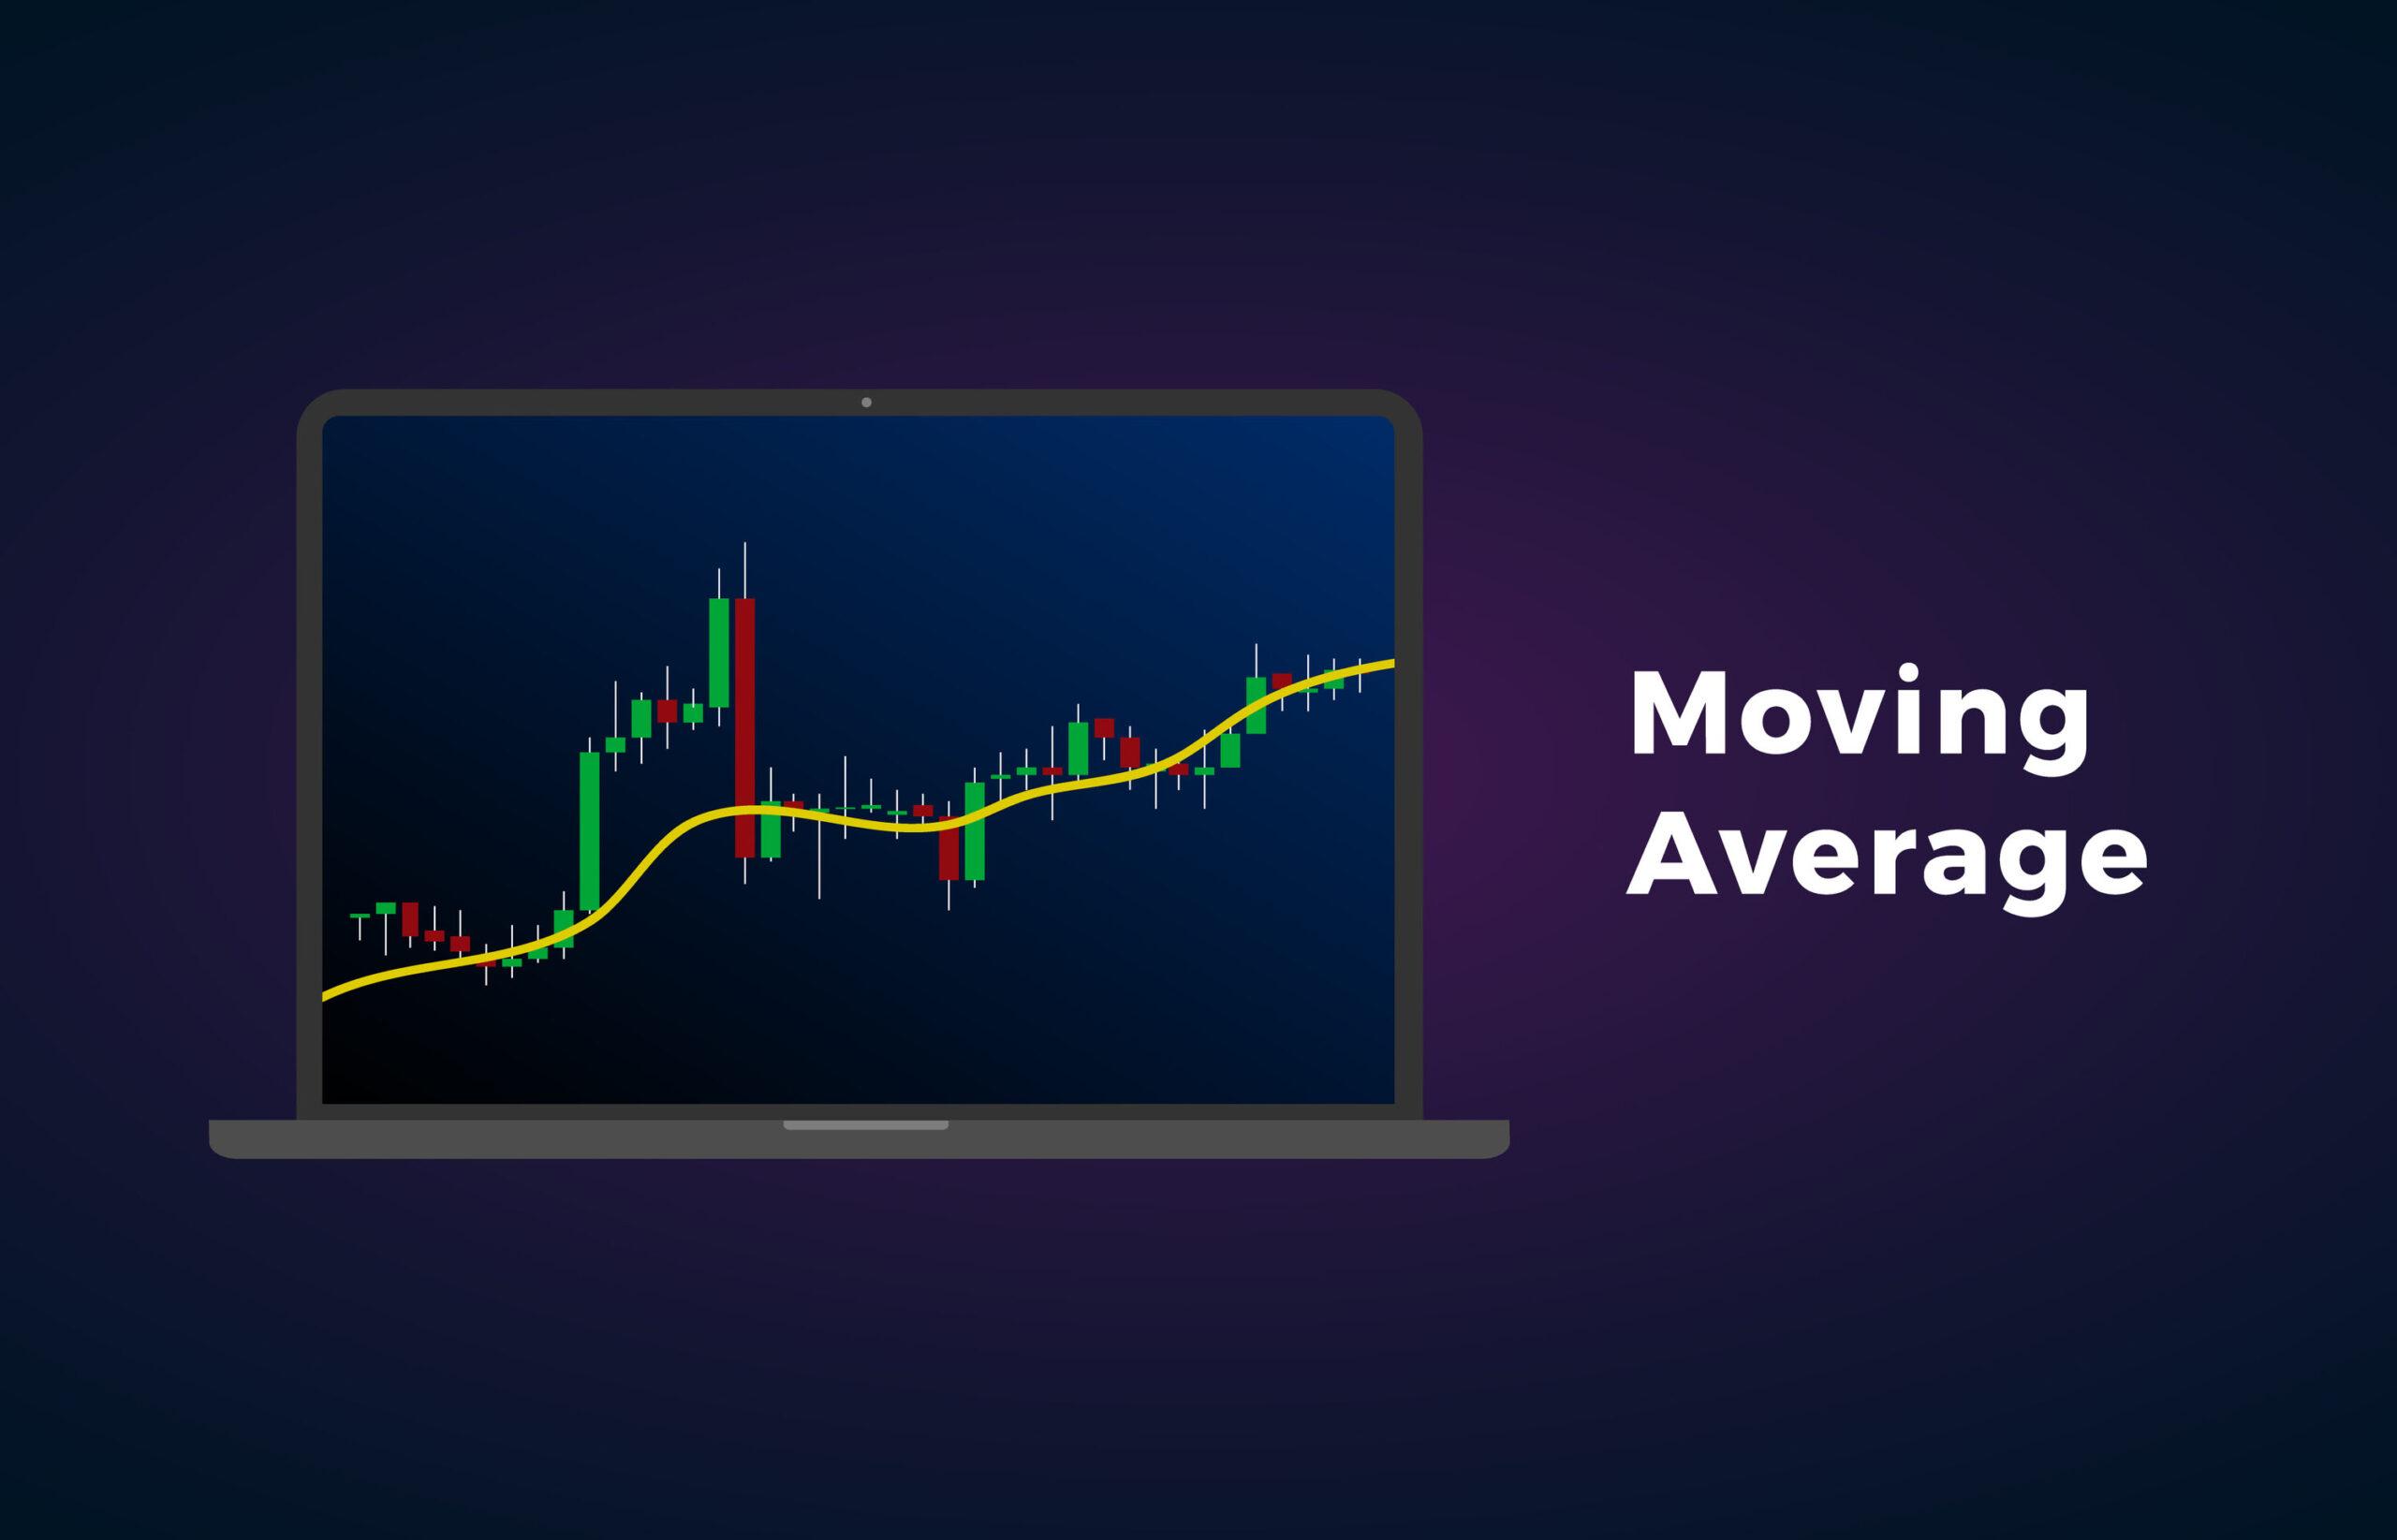 Indikator MACD moving average aksjer penger